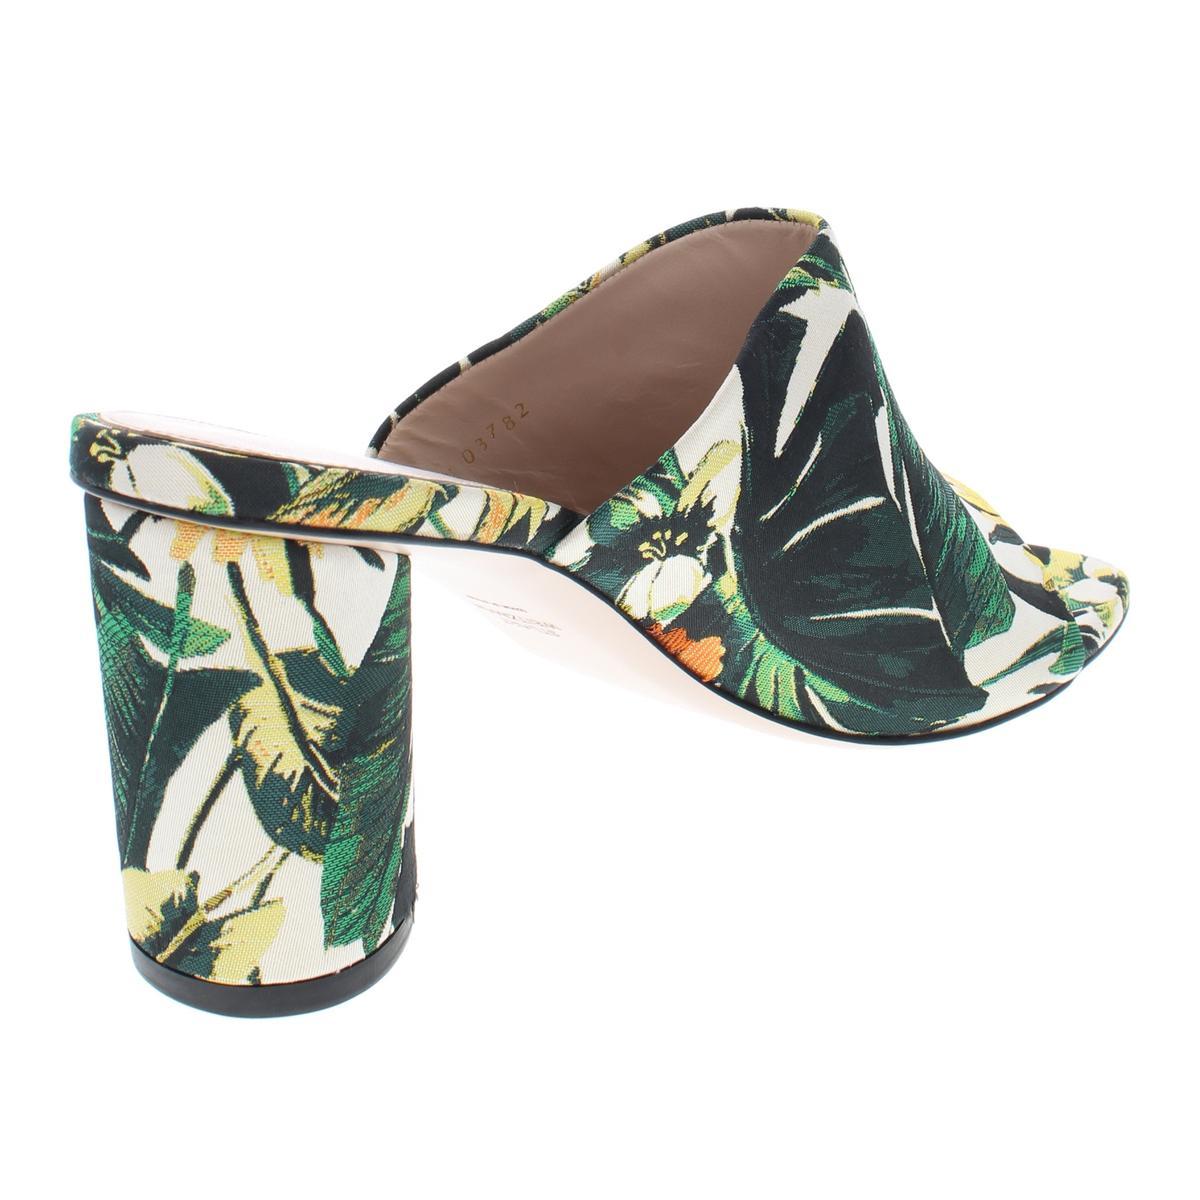 Stuart-Weitzman-Womens-Slide-On-Jacquard-Slide-Sandals-Heels-BHFO-5173 thumbnail 6